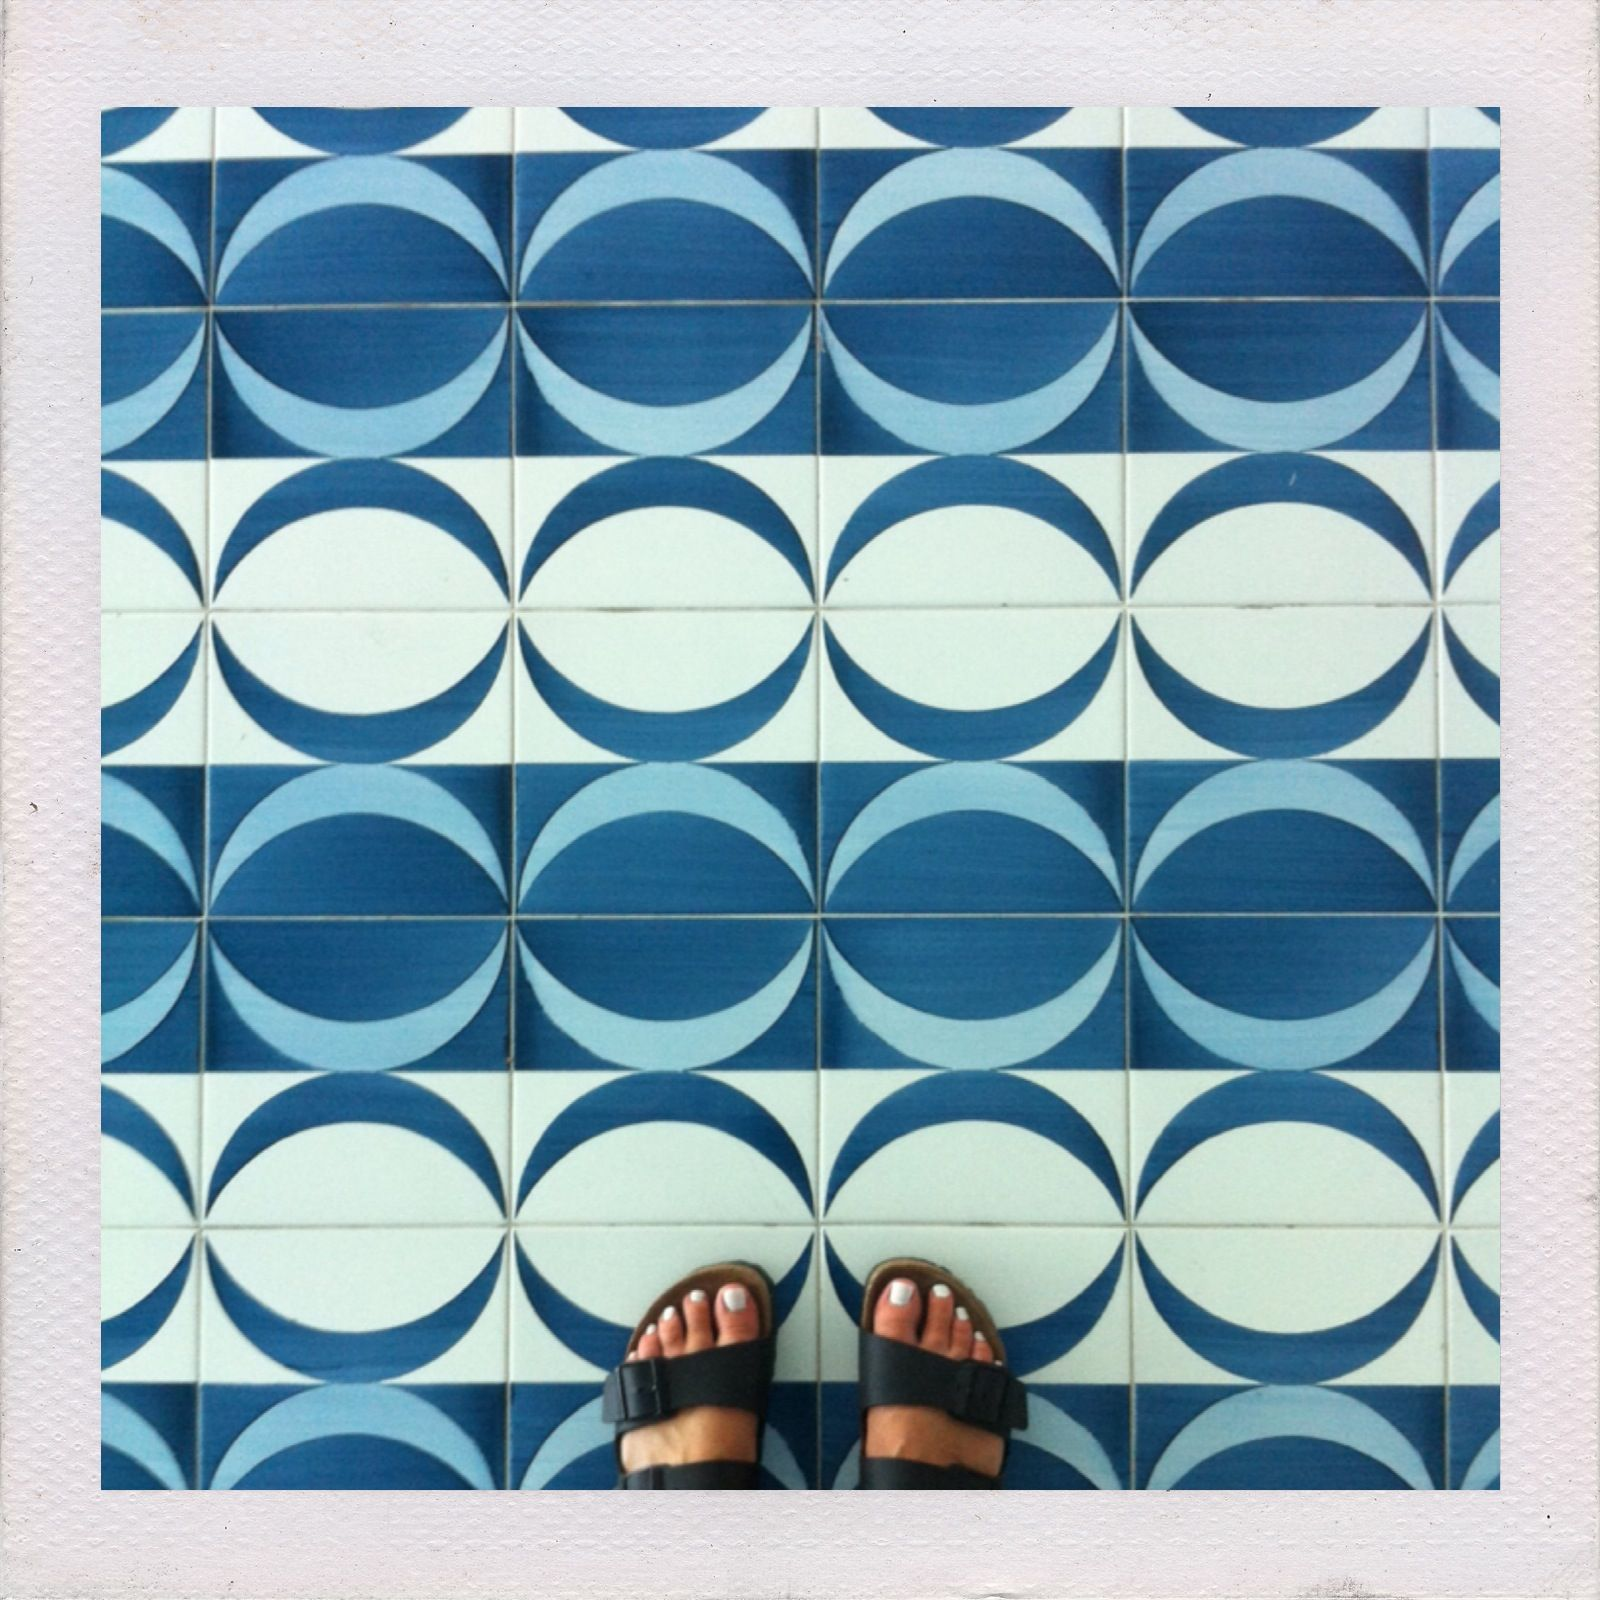 Birkenstocks and tiles by Gio Ponti at Parco dei Principi, Sorrento ...